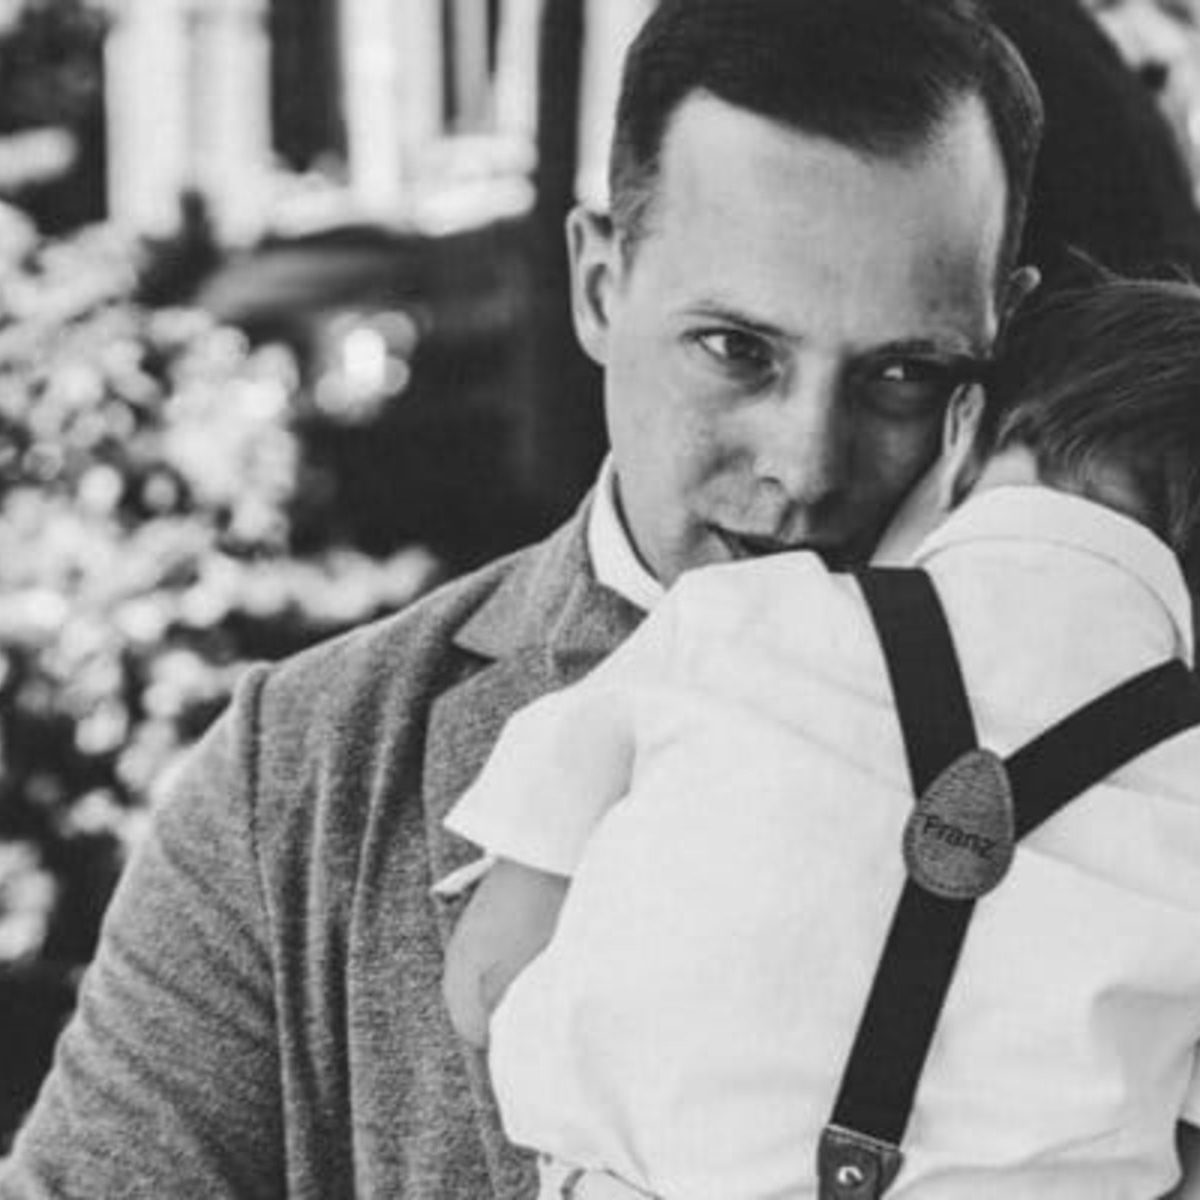 Kinderhosentraeger Franz schwarz weiss